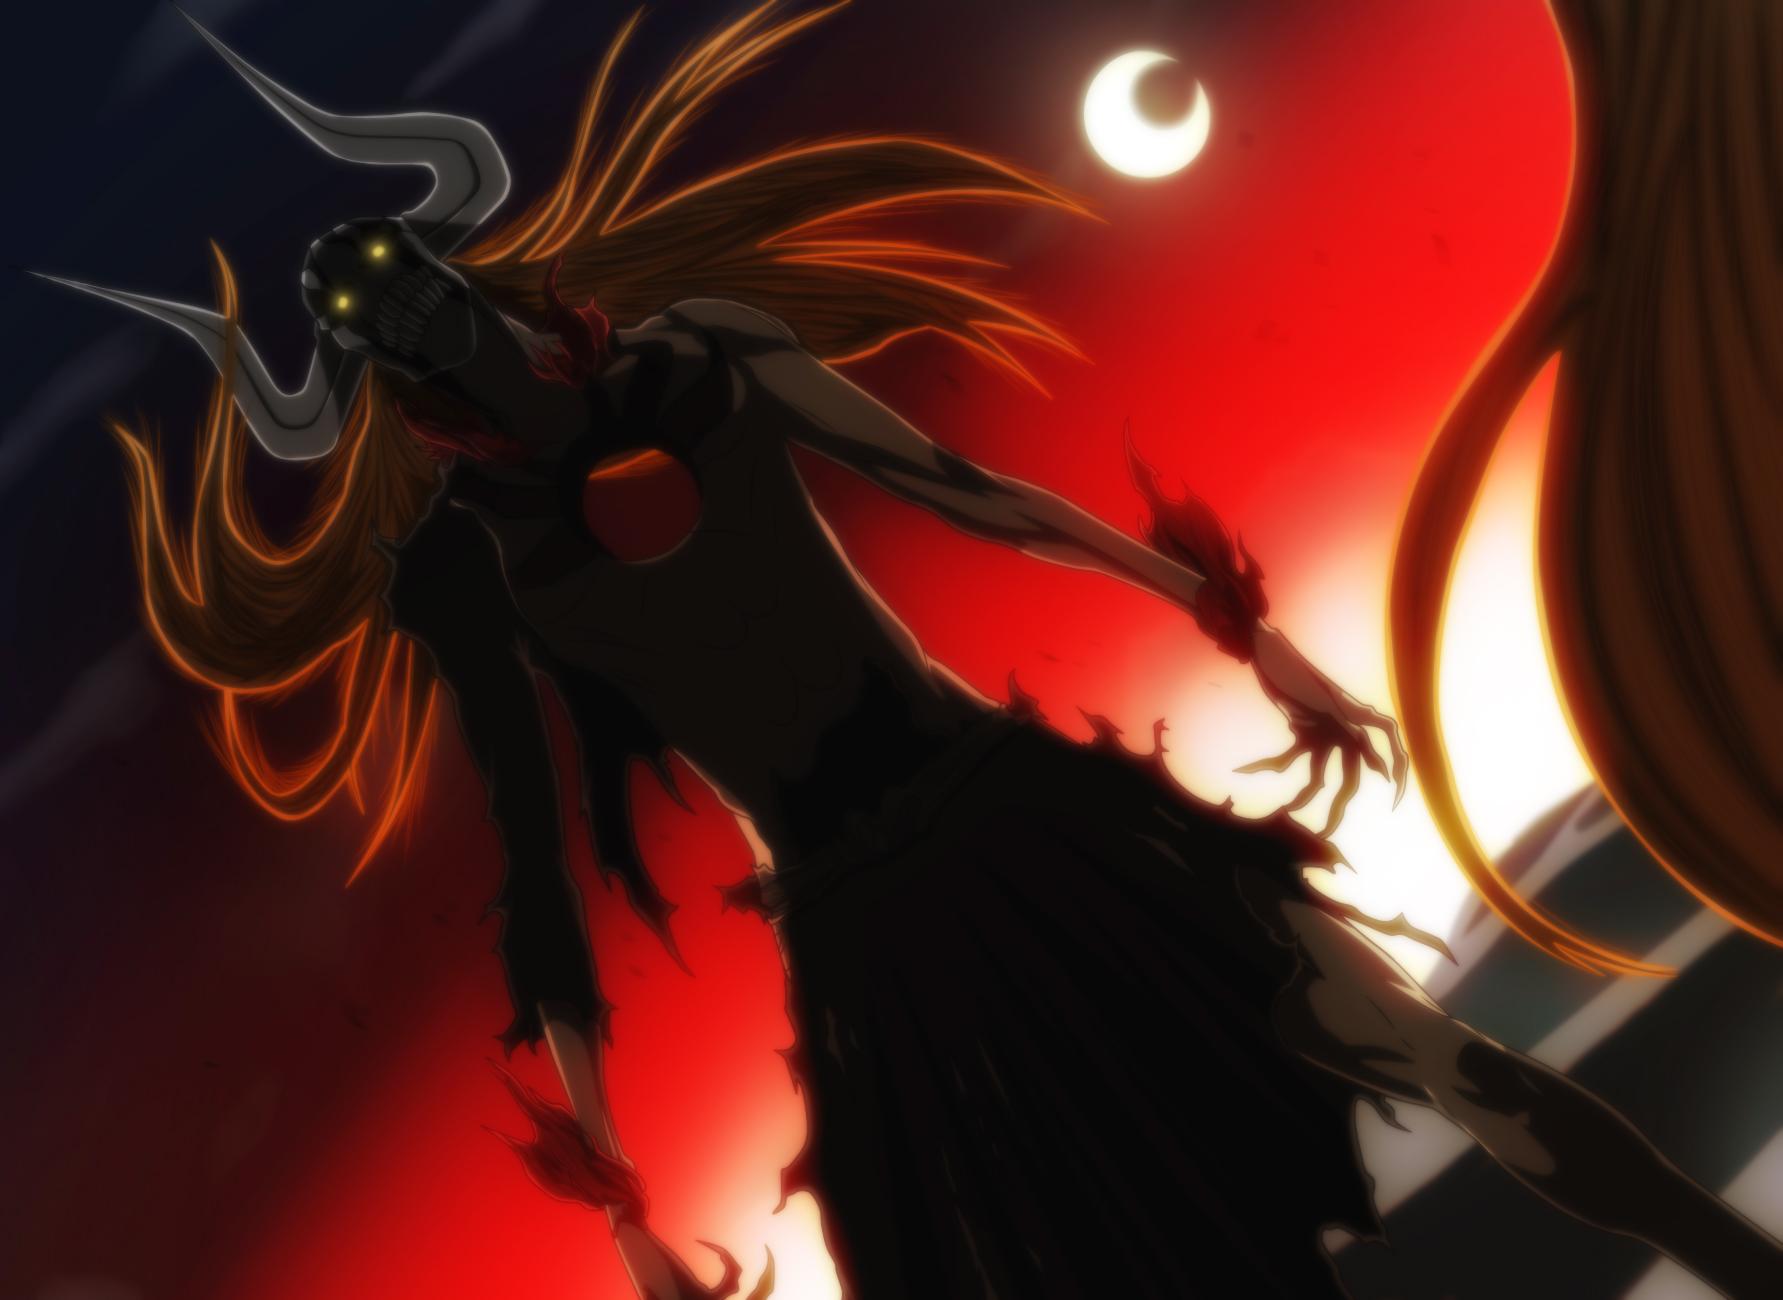 8 Cool Hollow Ichigo Wallpapers | Daily Anime Art